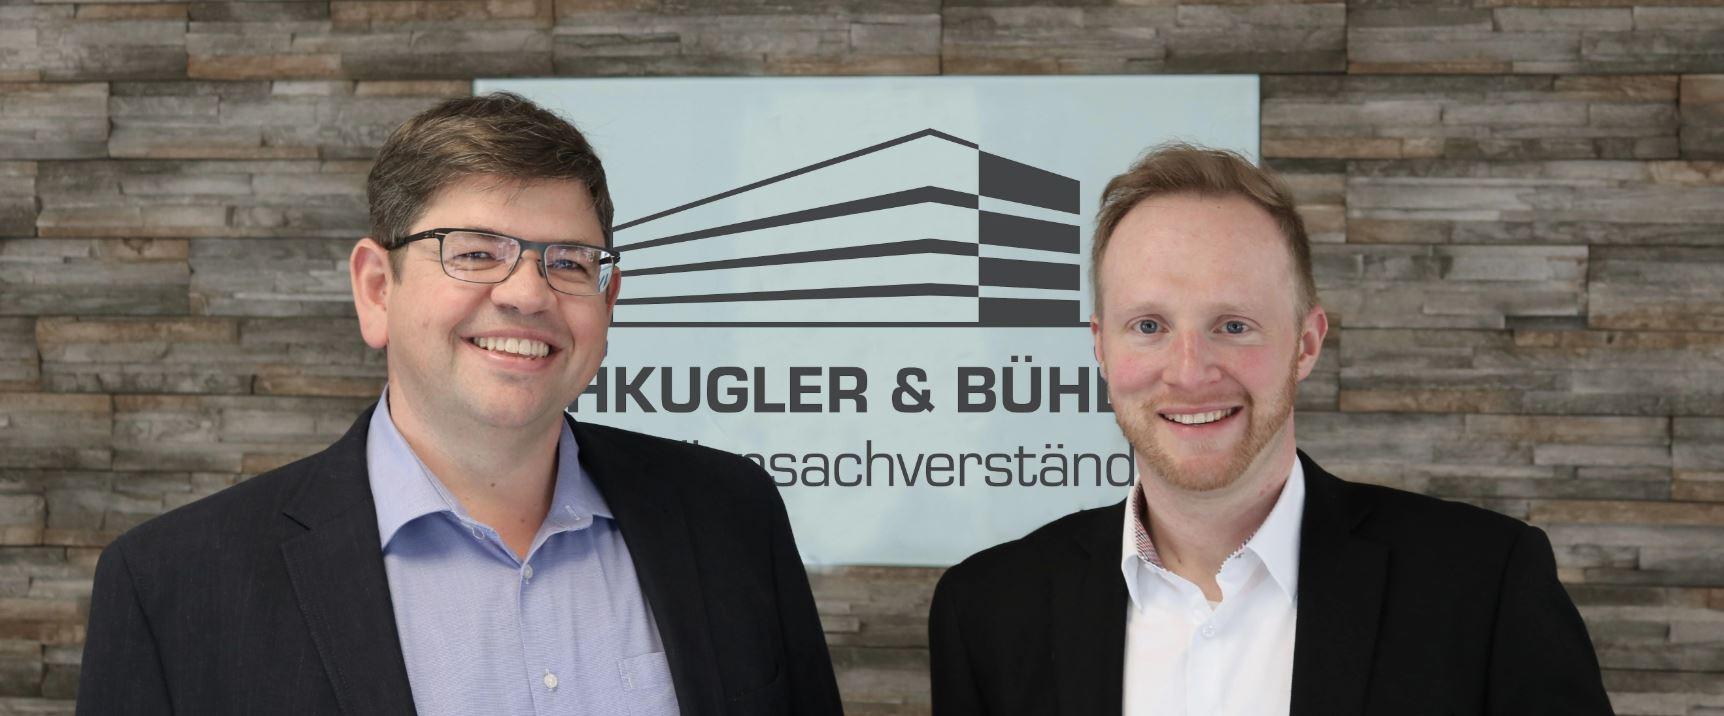 Rehkugler-Buehler.de Immobiliengutachter Immobiliensachverständiger